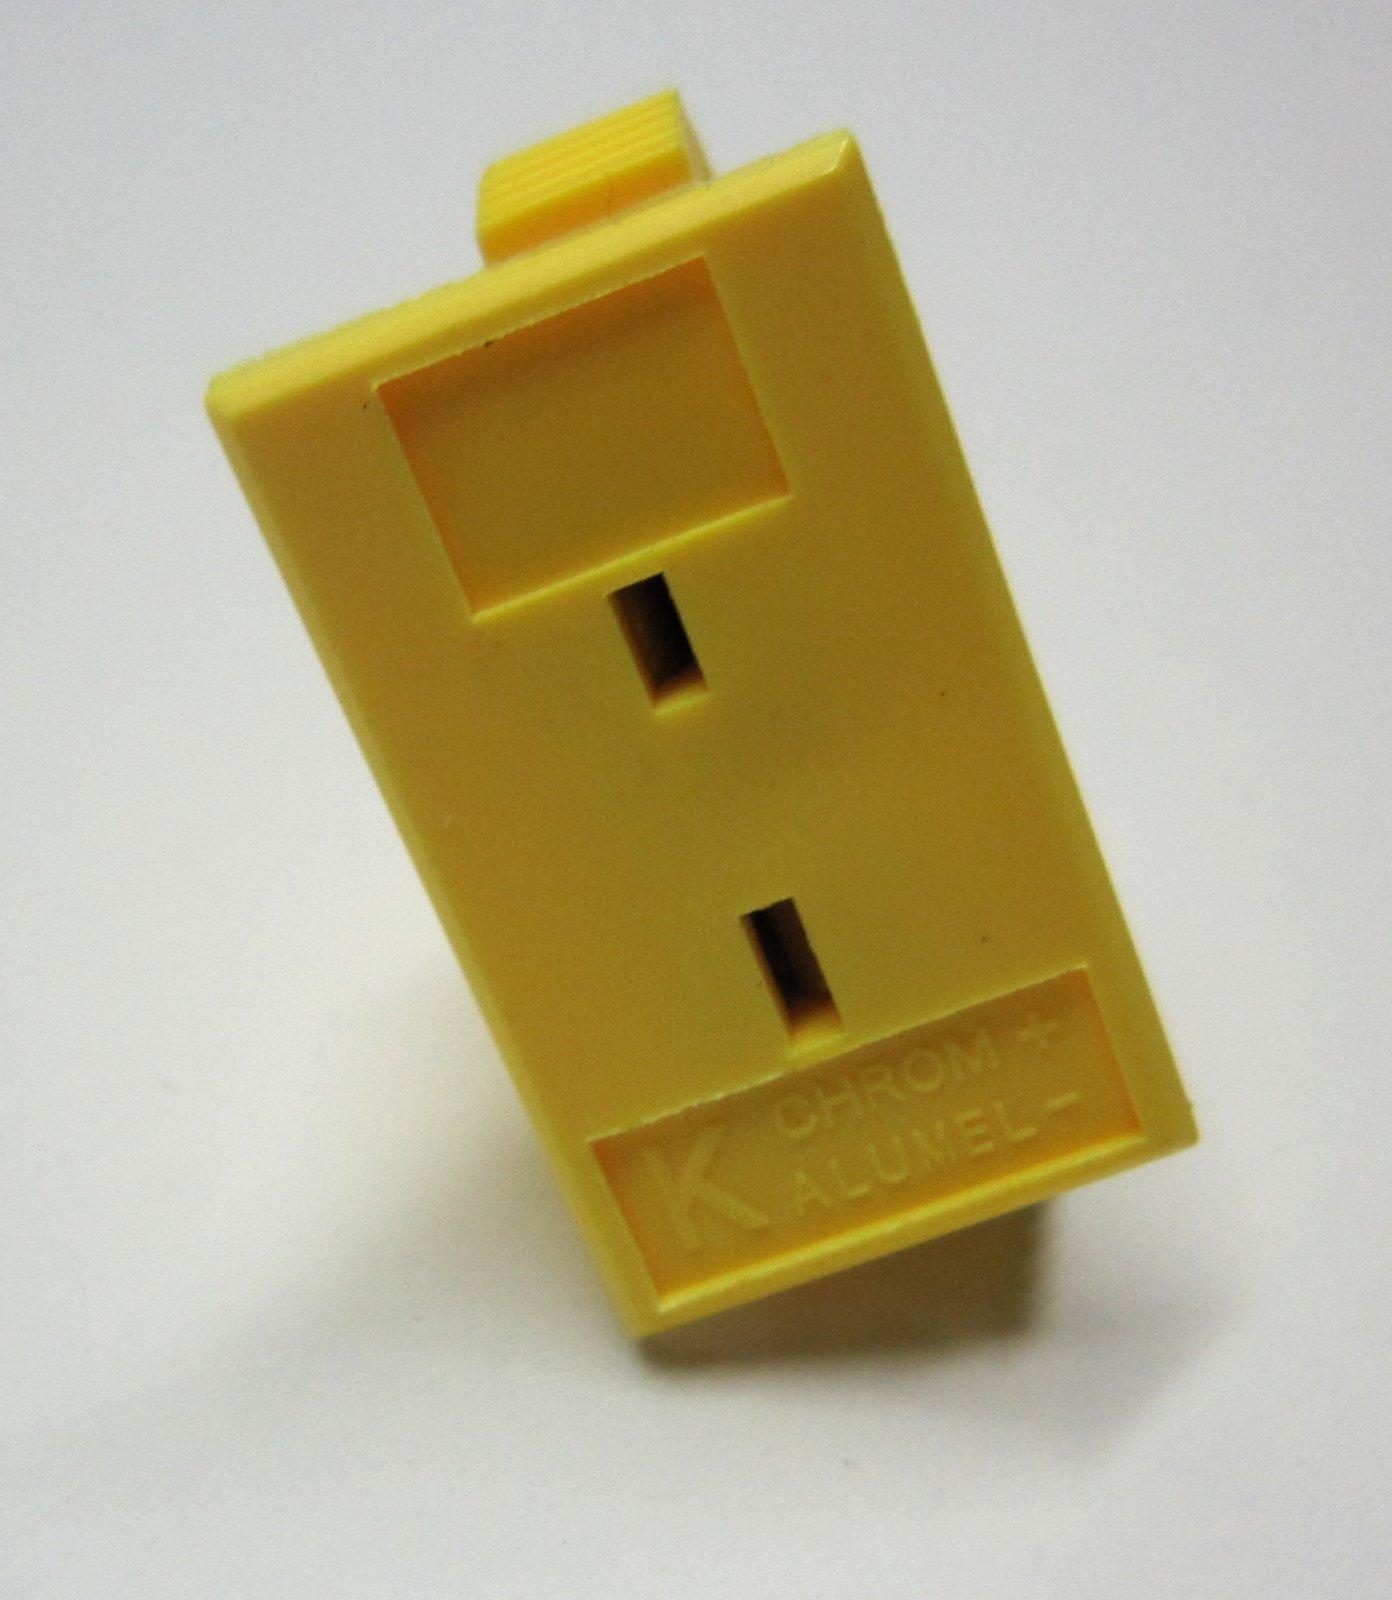 Panel Mount k-Type thermocouple Miniature Jack Socket for Miniature thermocouple Connector Plug